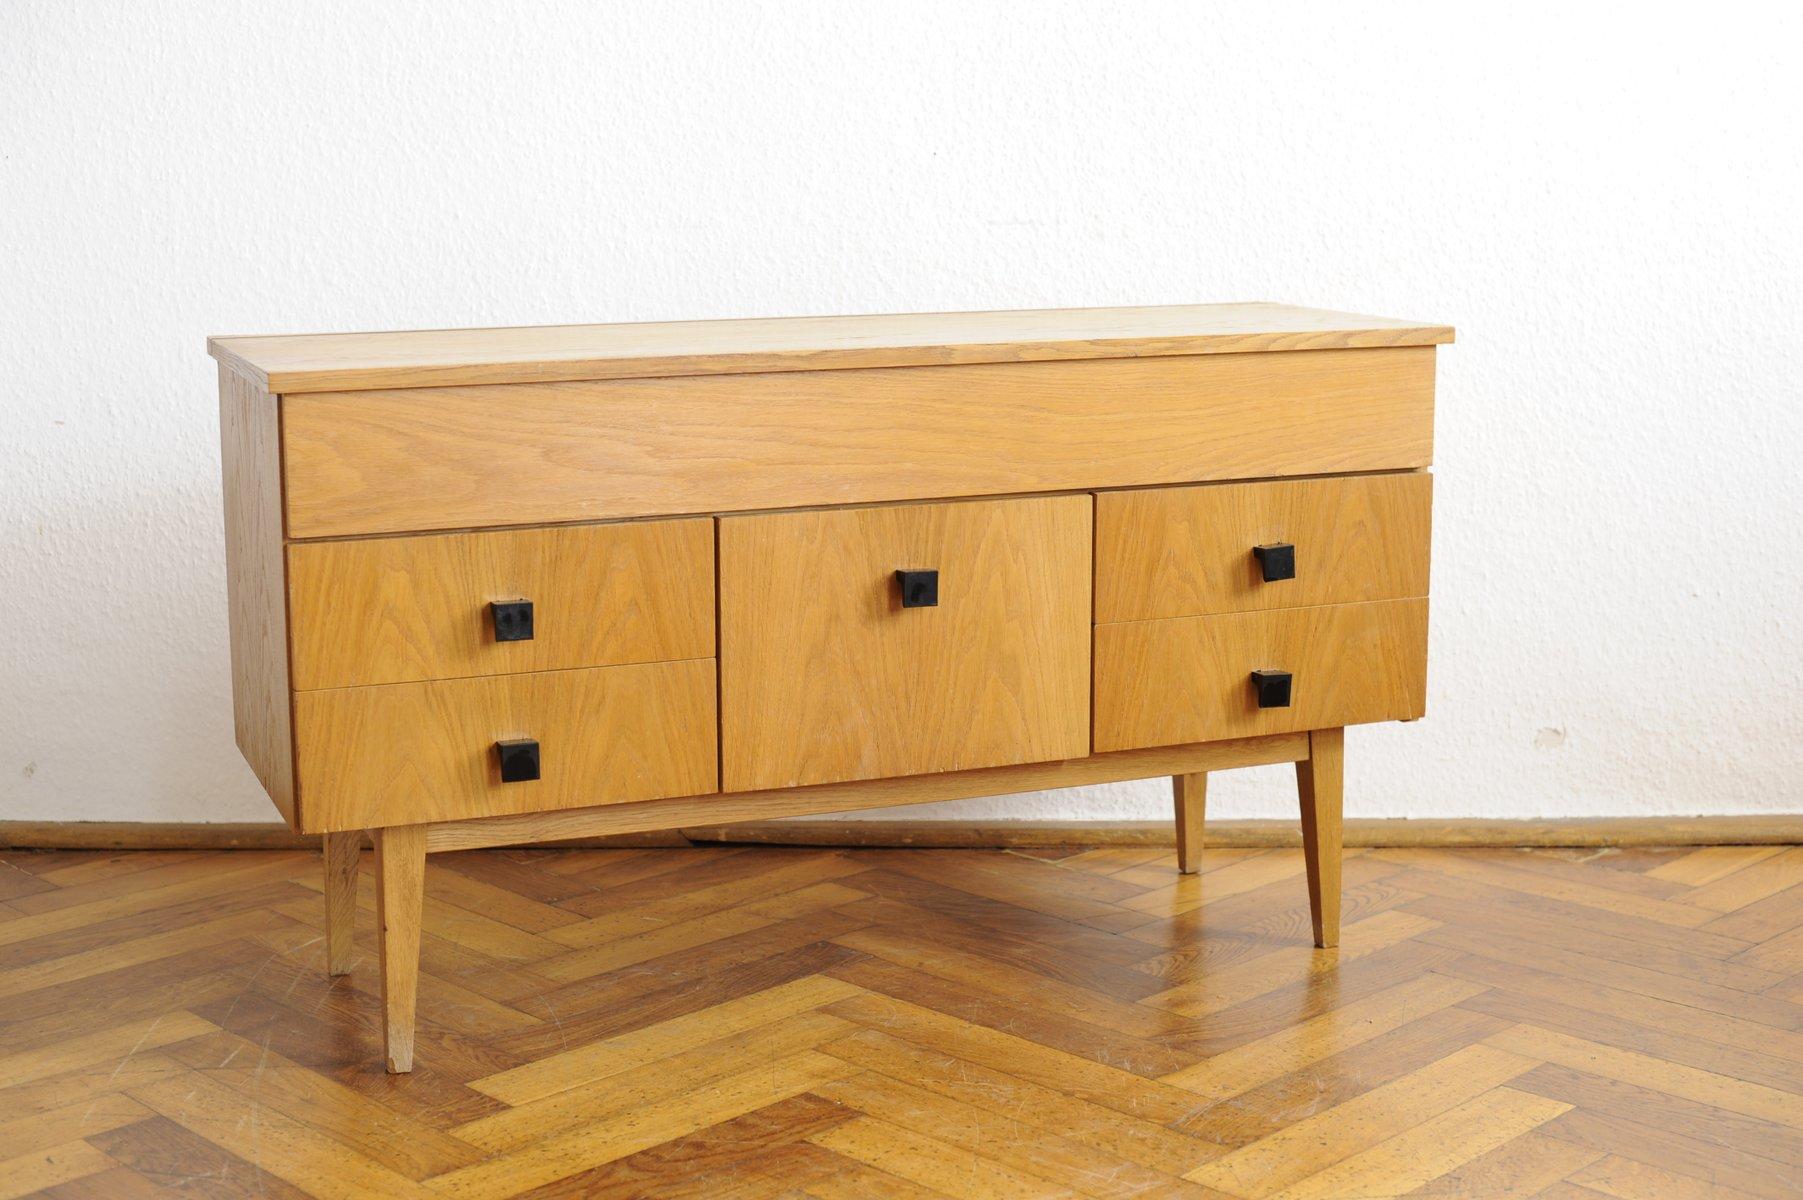 modernistisches vintage sideboard mit buchenholz furnier. Black Bedroom Furniture Sets. Home Design Ideas